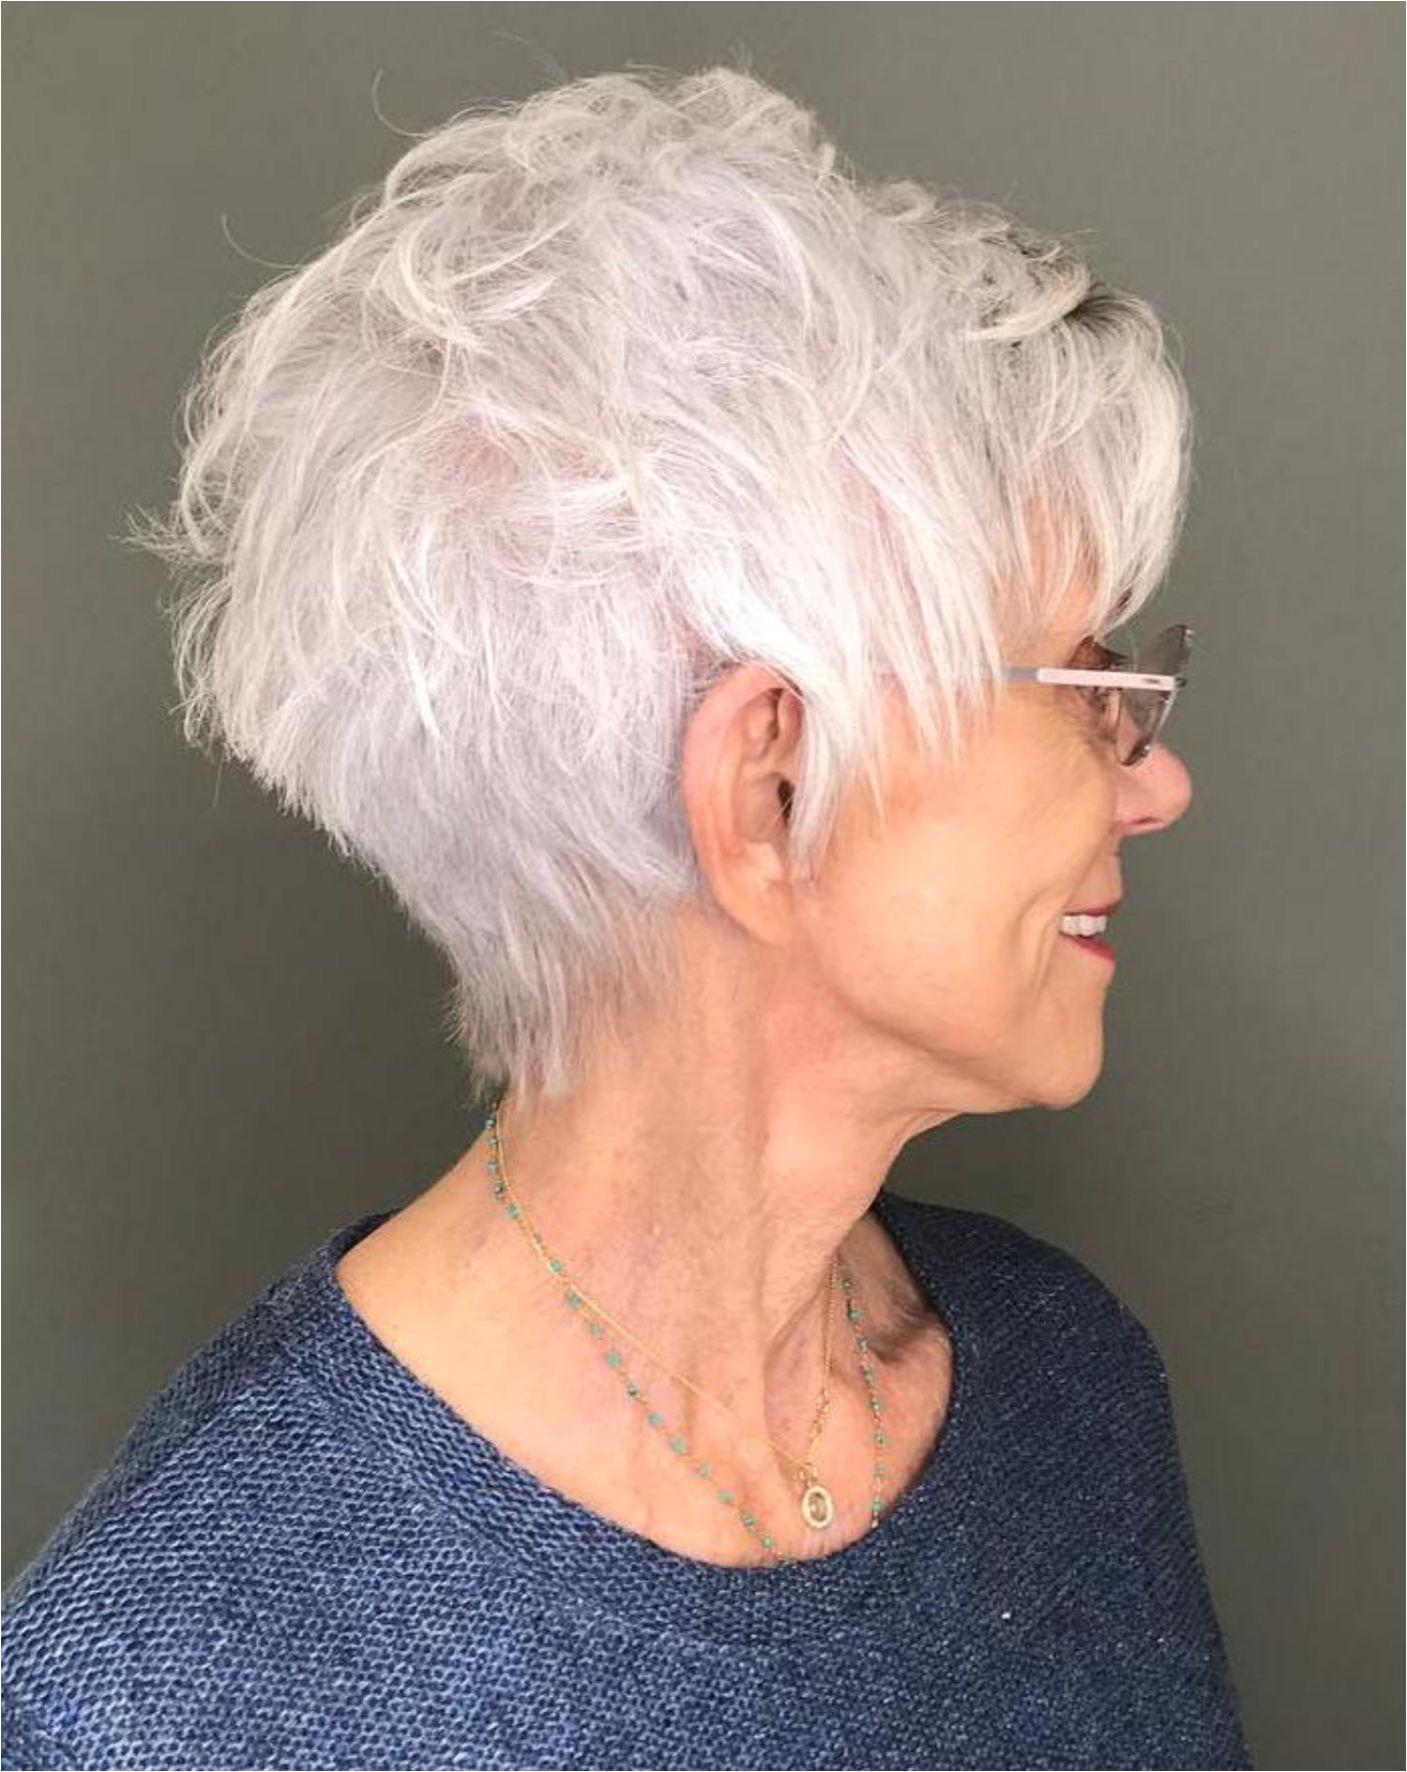 Textured Silver Pixie For Older Women